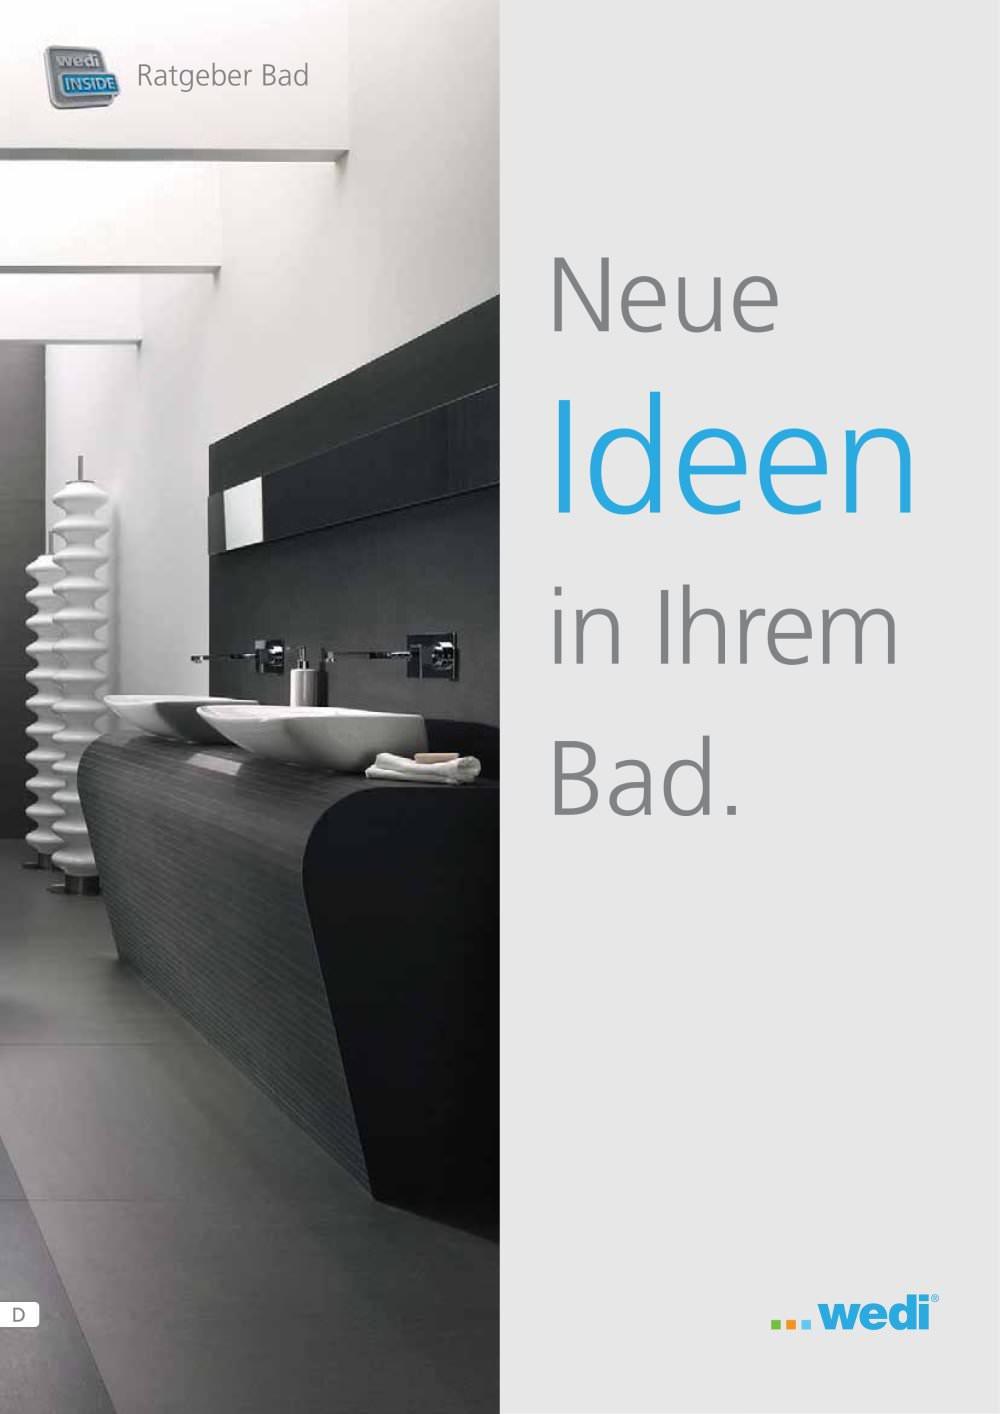 Ratgeber Bad - wedi GmbH - PDF Katalog | Beschreibung | Prospekt